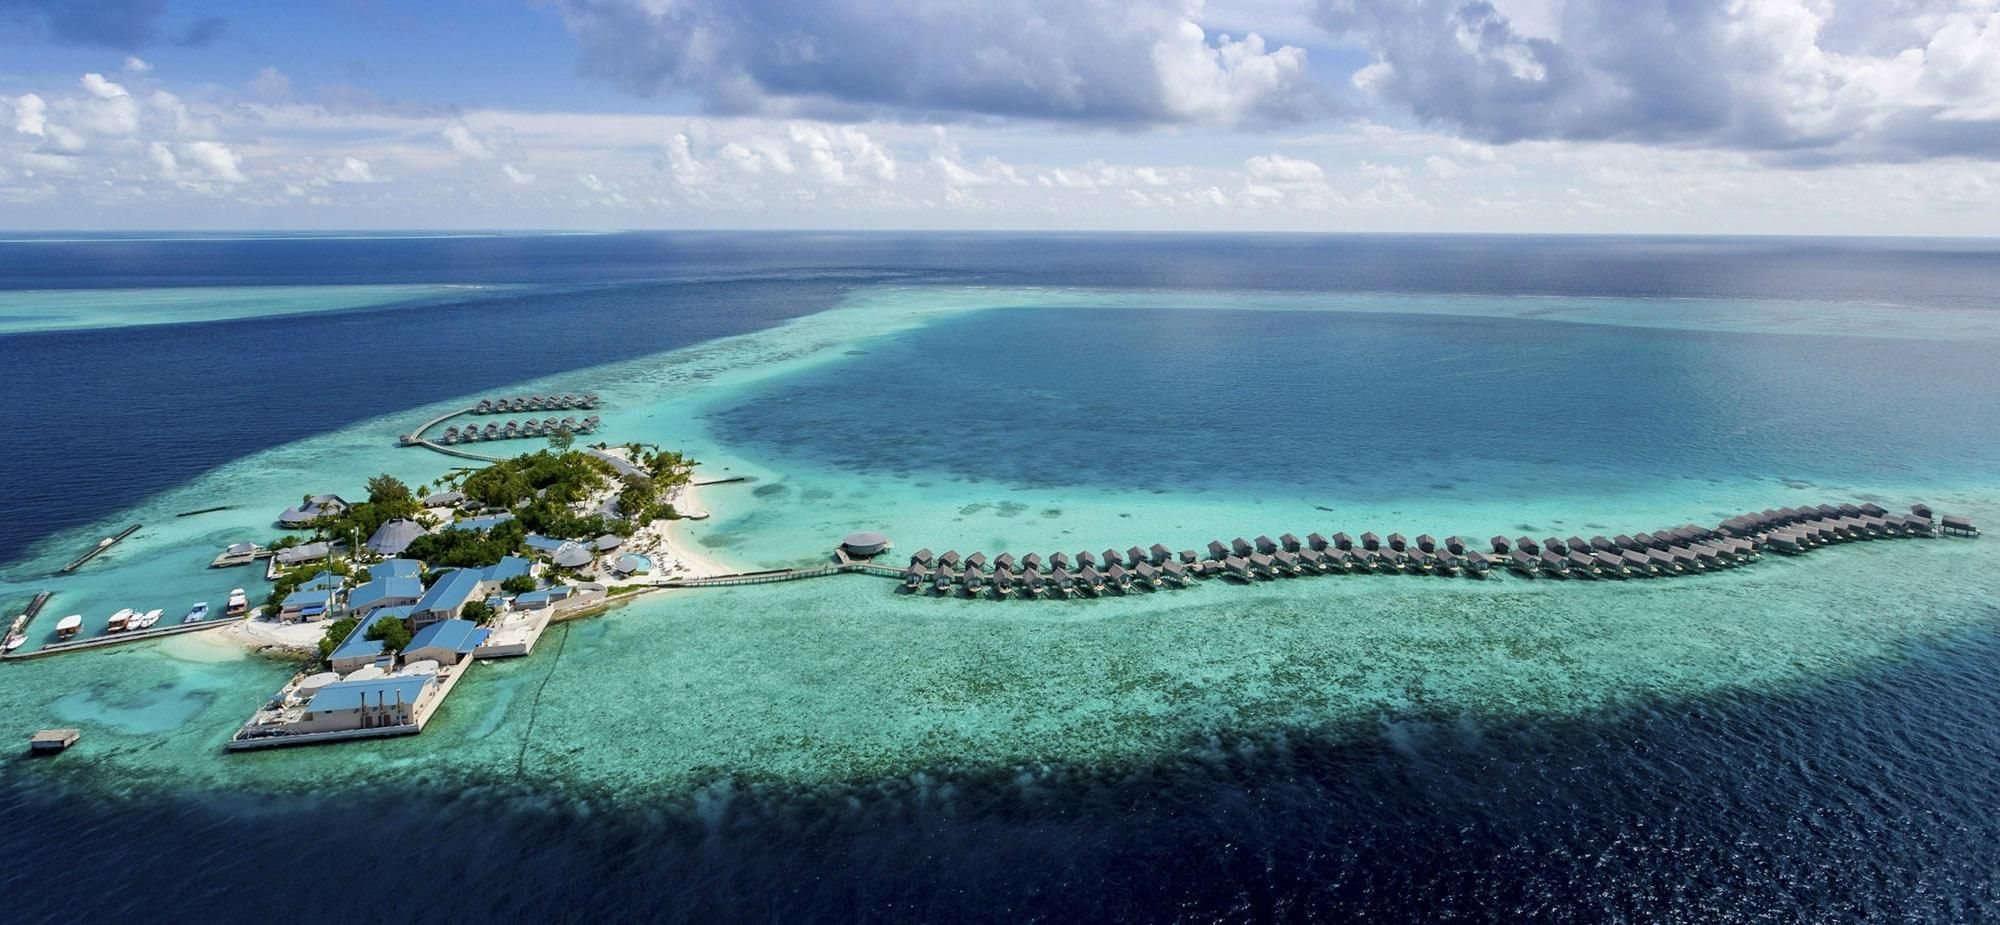 Centara Ras Fushi Resort Spa Maldives Maldives Luxury Resorts Maldives Hotel Best Hotels In Maldives